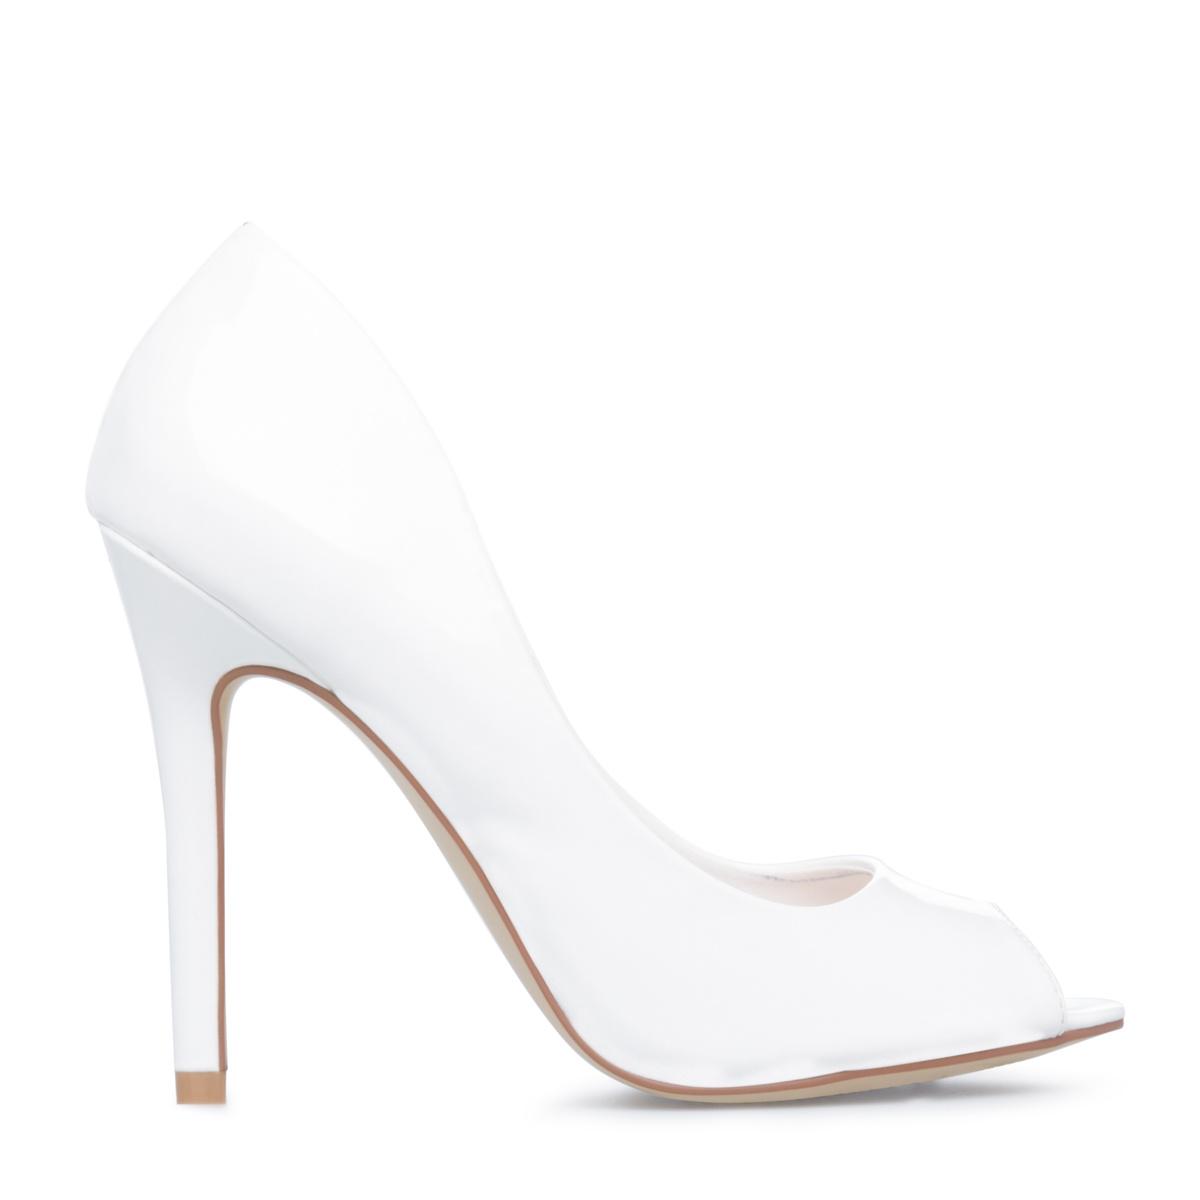 Platform Pumps Women&39s Discount Shoes Peep Toe Pumps High Heels